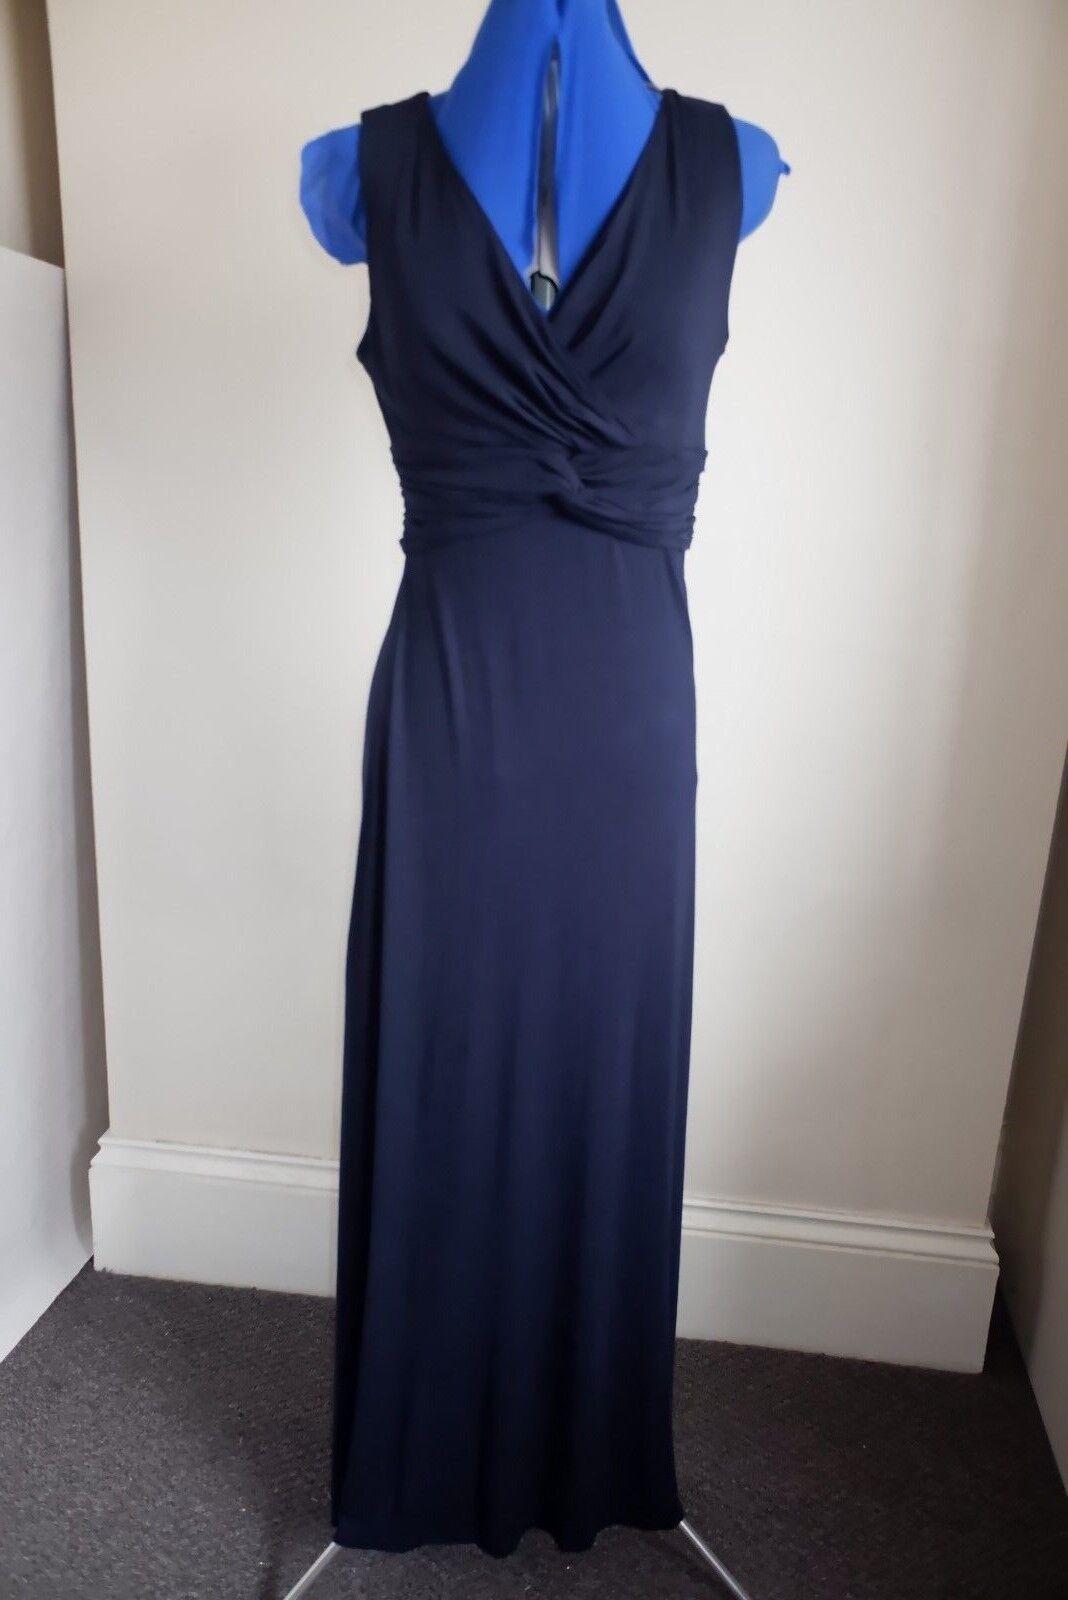 U LONG DRESS EVENING SPECIAL OCCASION KALIKO MAXI nnwdaq3436-Dresses ... 5e2977bfa29